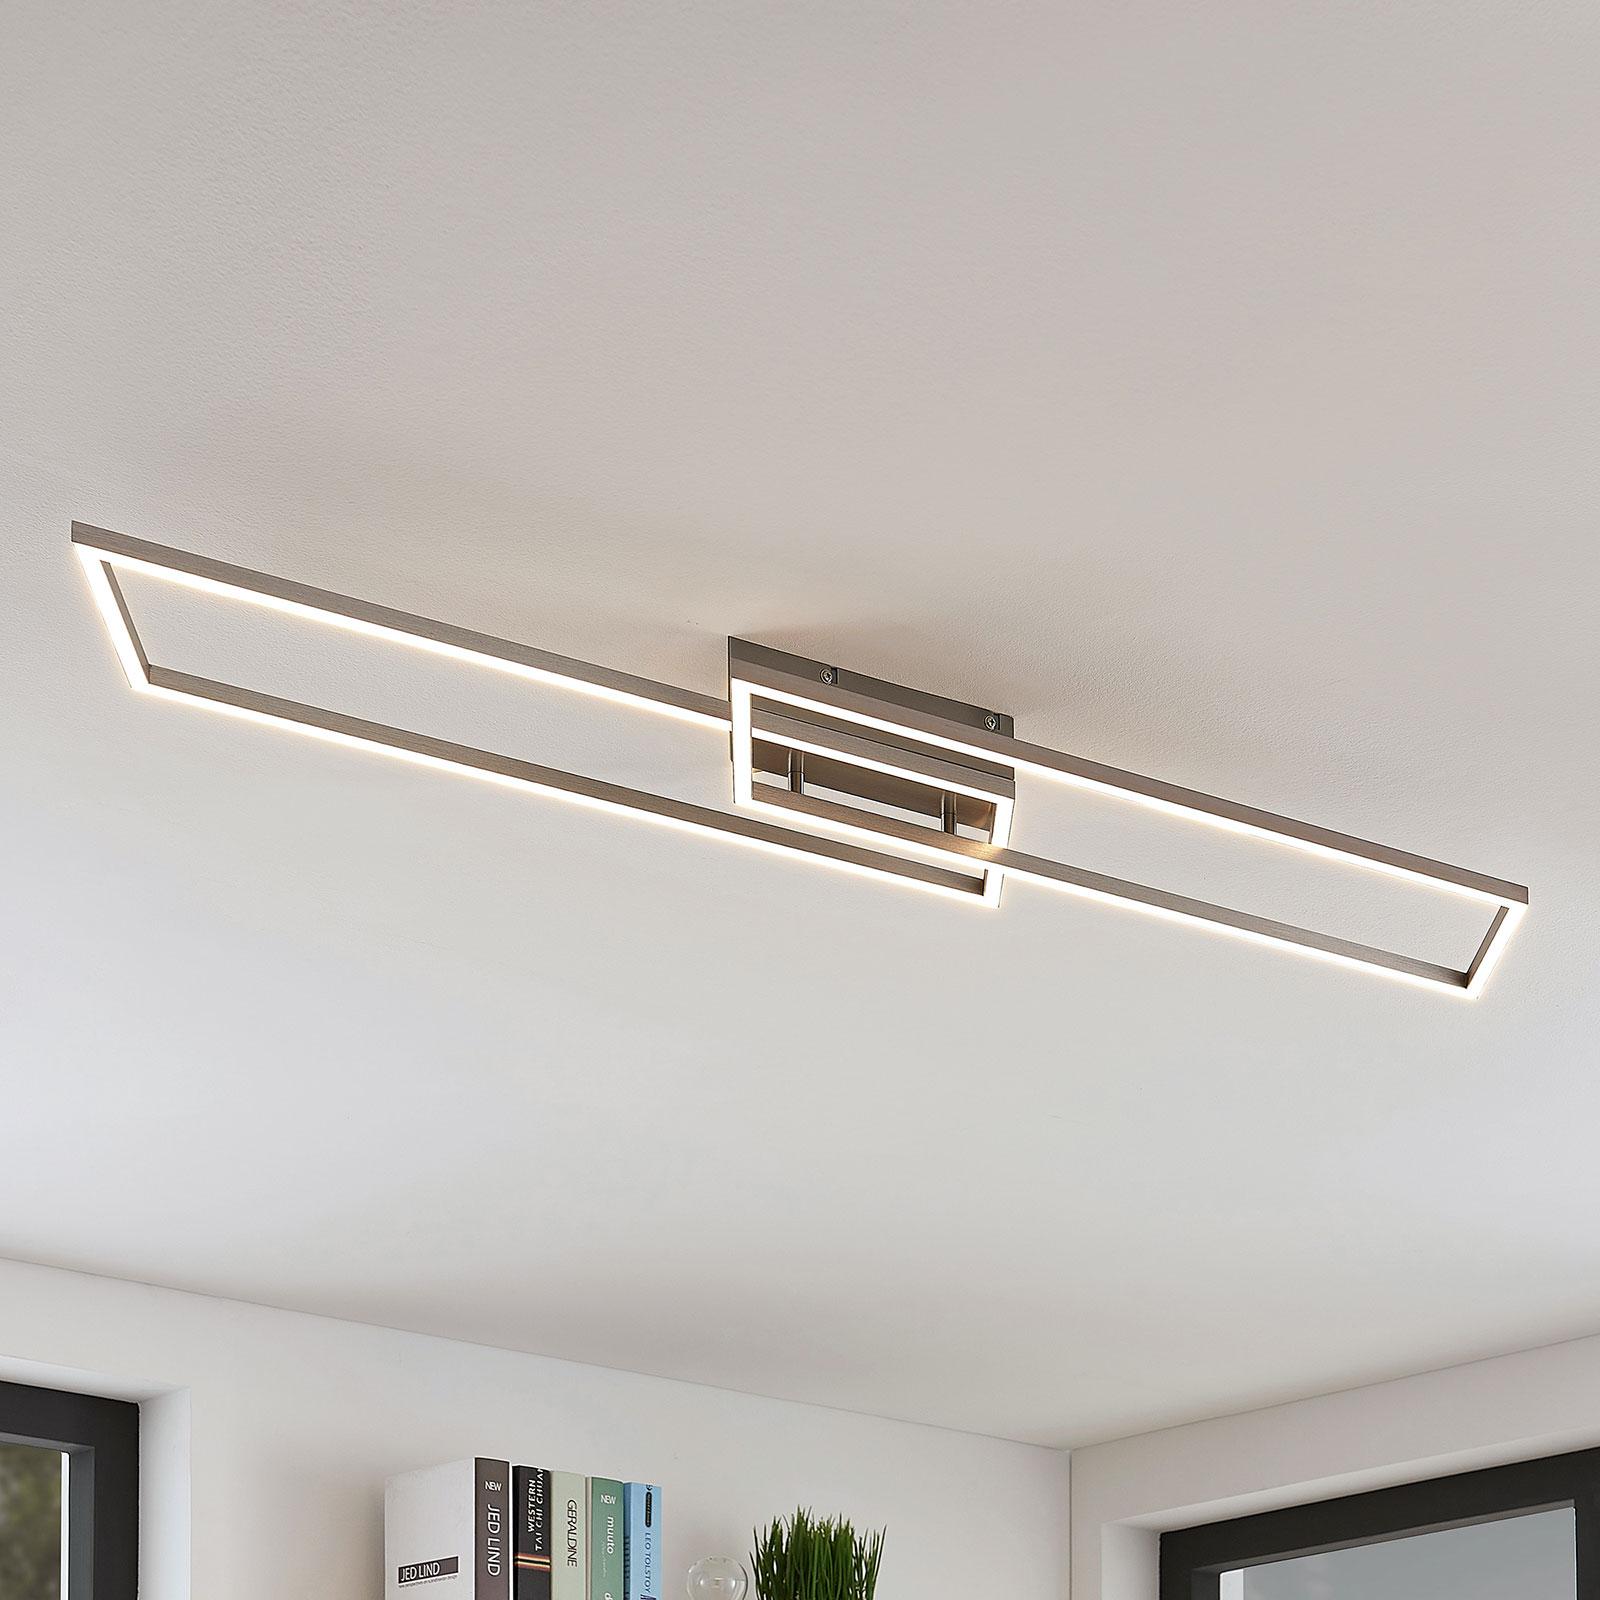 LED-Deckenlampe Quadra, dimmbar, 2-flg, 113,2 cm